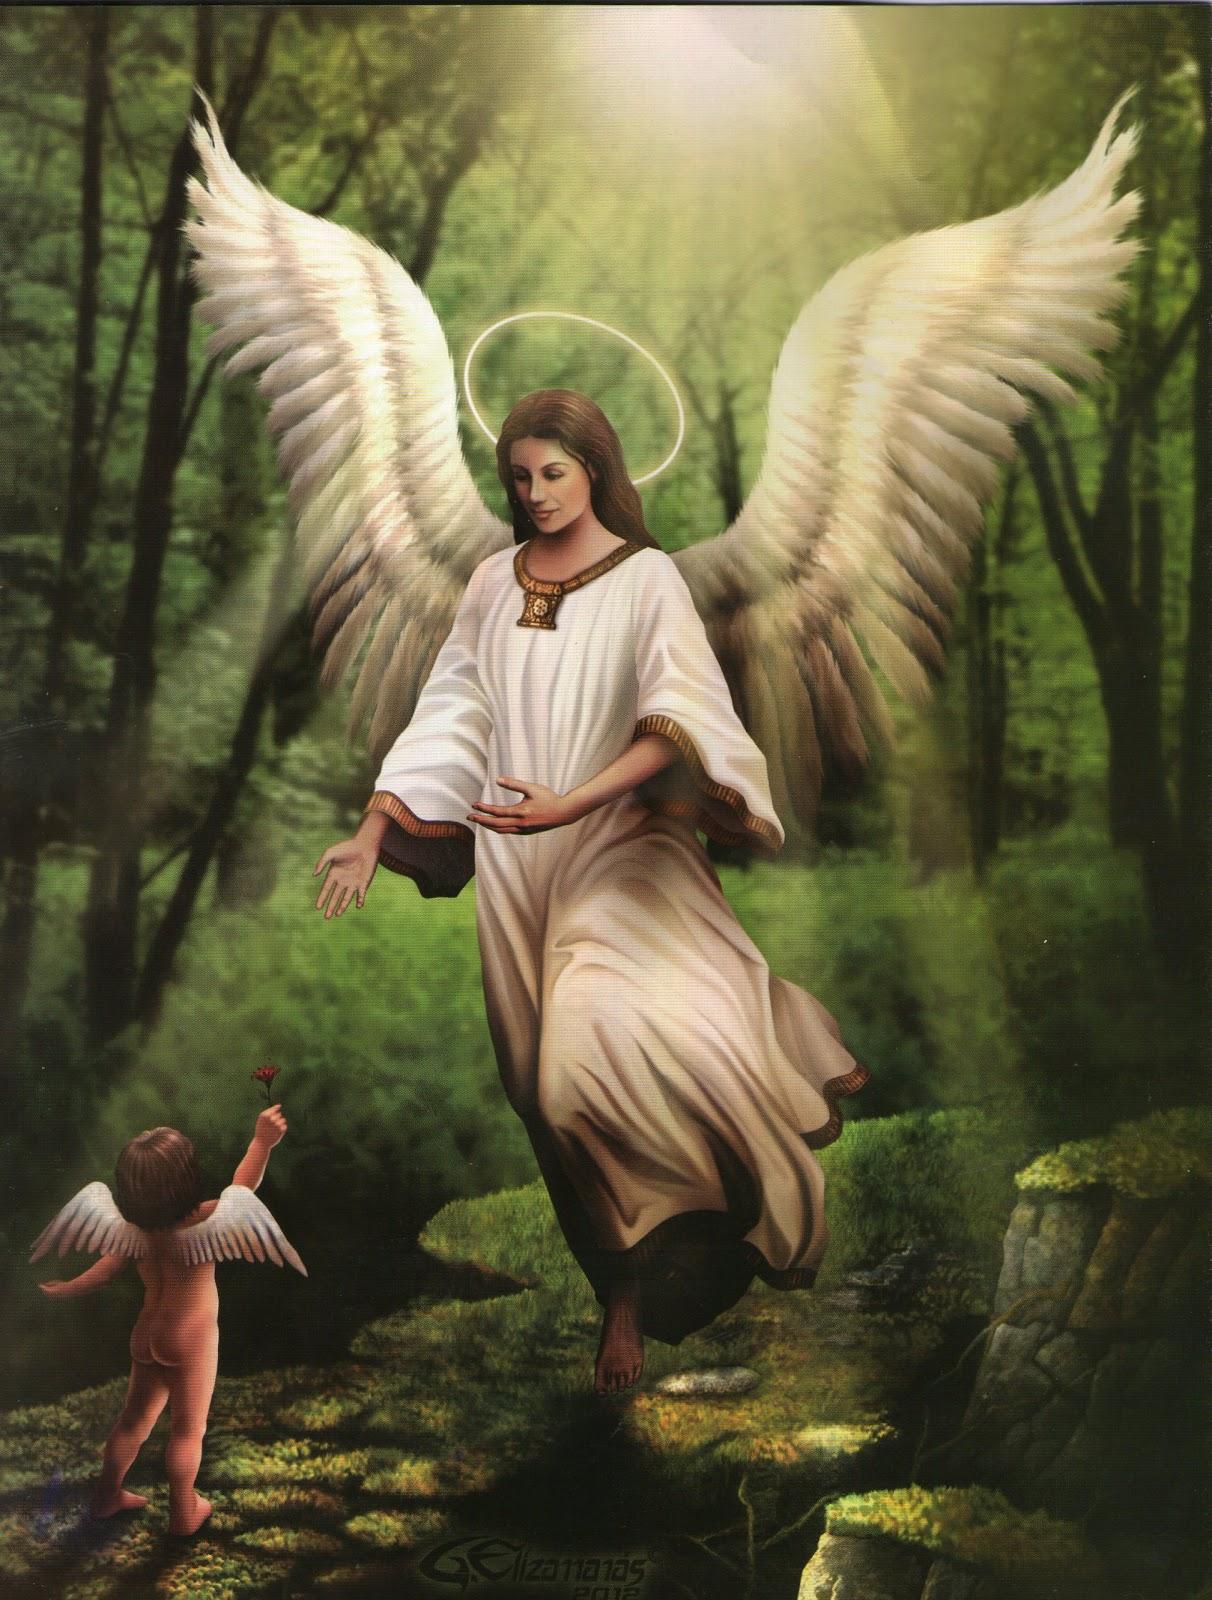 foto angel querubin: